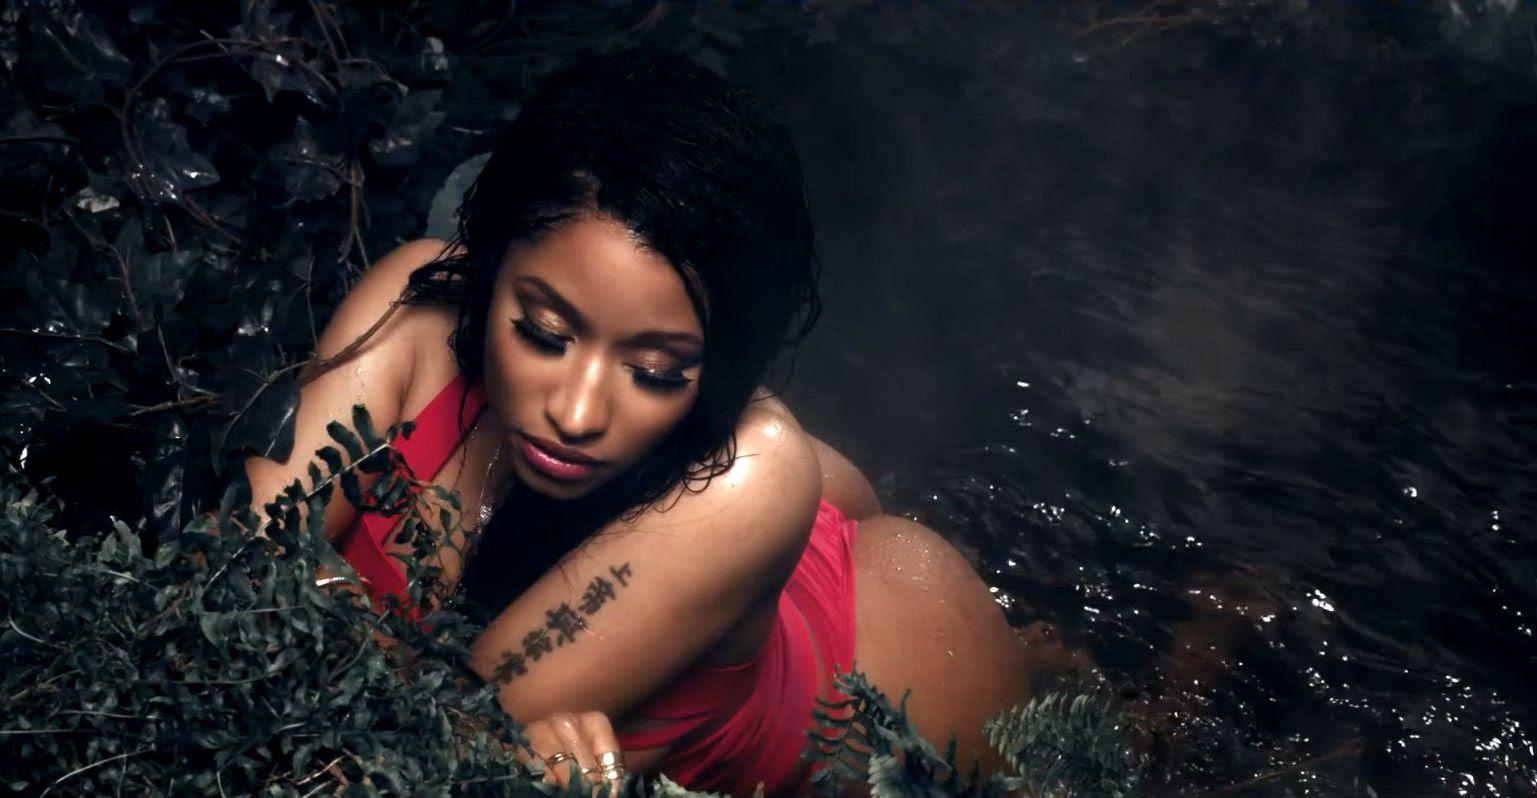 Nicki Minaj : Anaconda (Video) photo anaconda-nicki-minaj-8.jpg